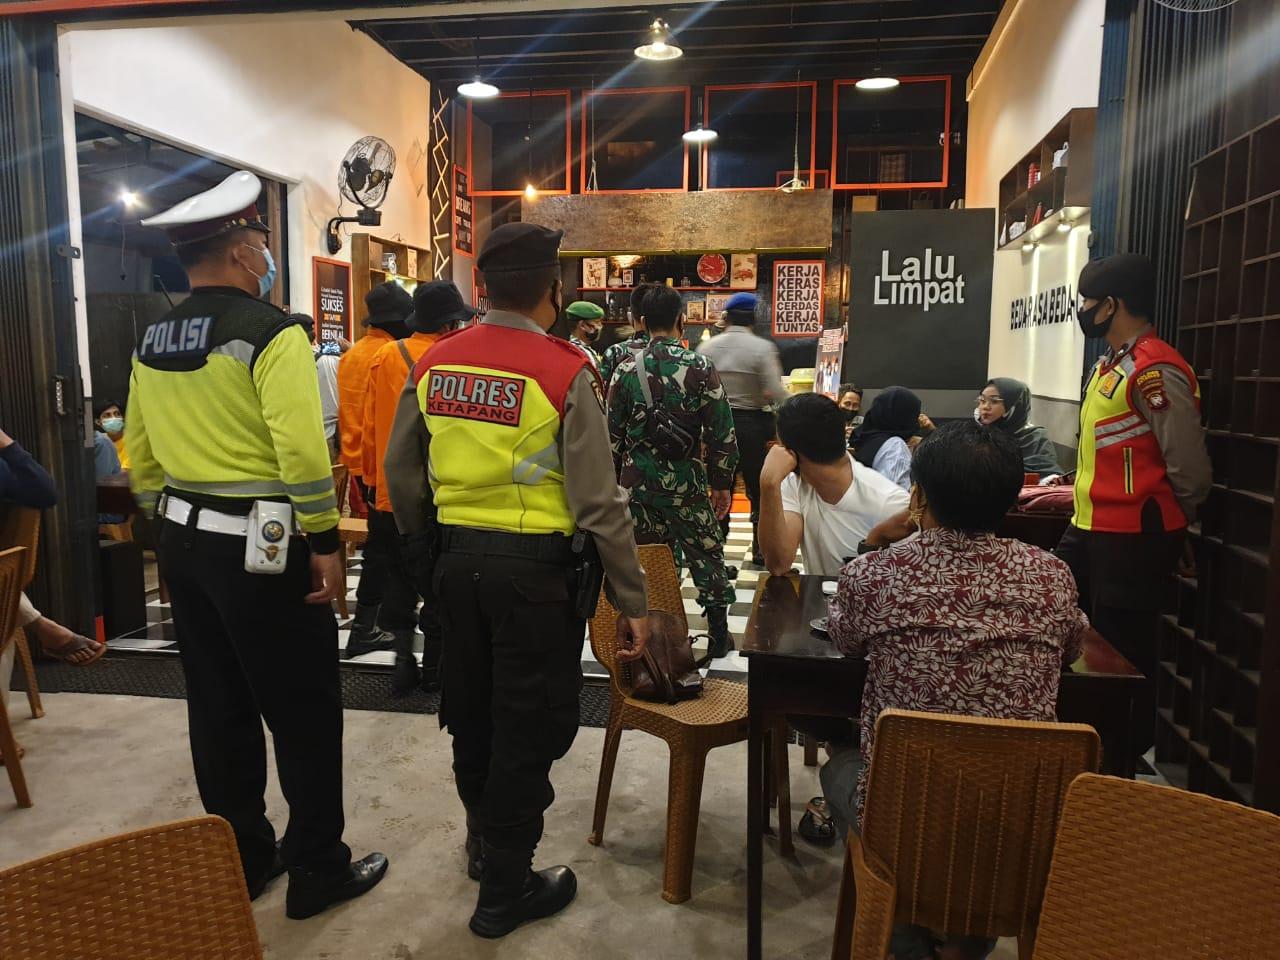 Satlantas Polres Ketapang Patroli Warkop, Berikan Himbauan Jaga Jarak & Penggunaan Masker